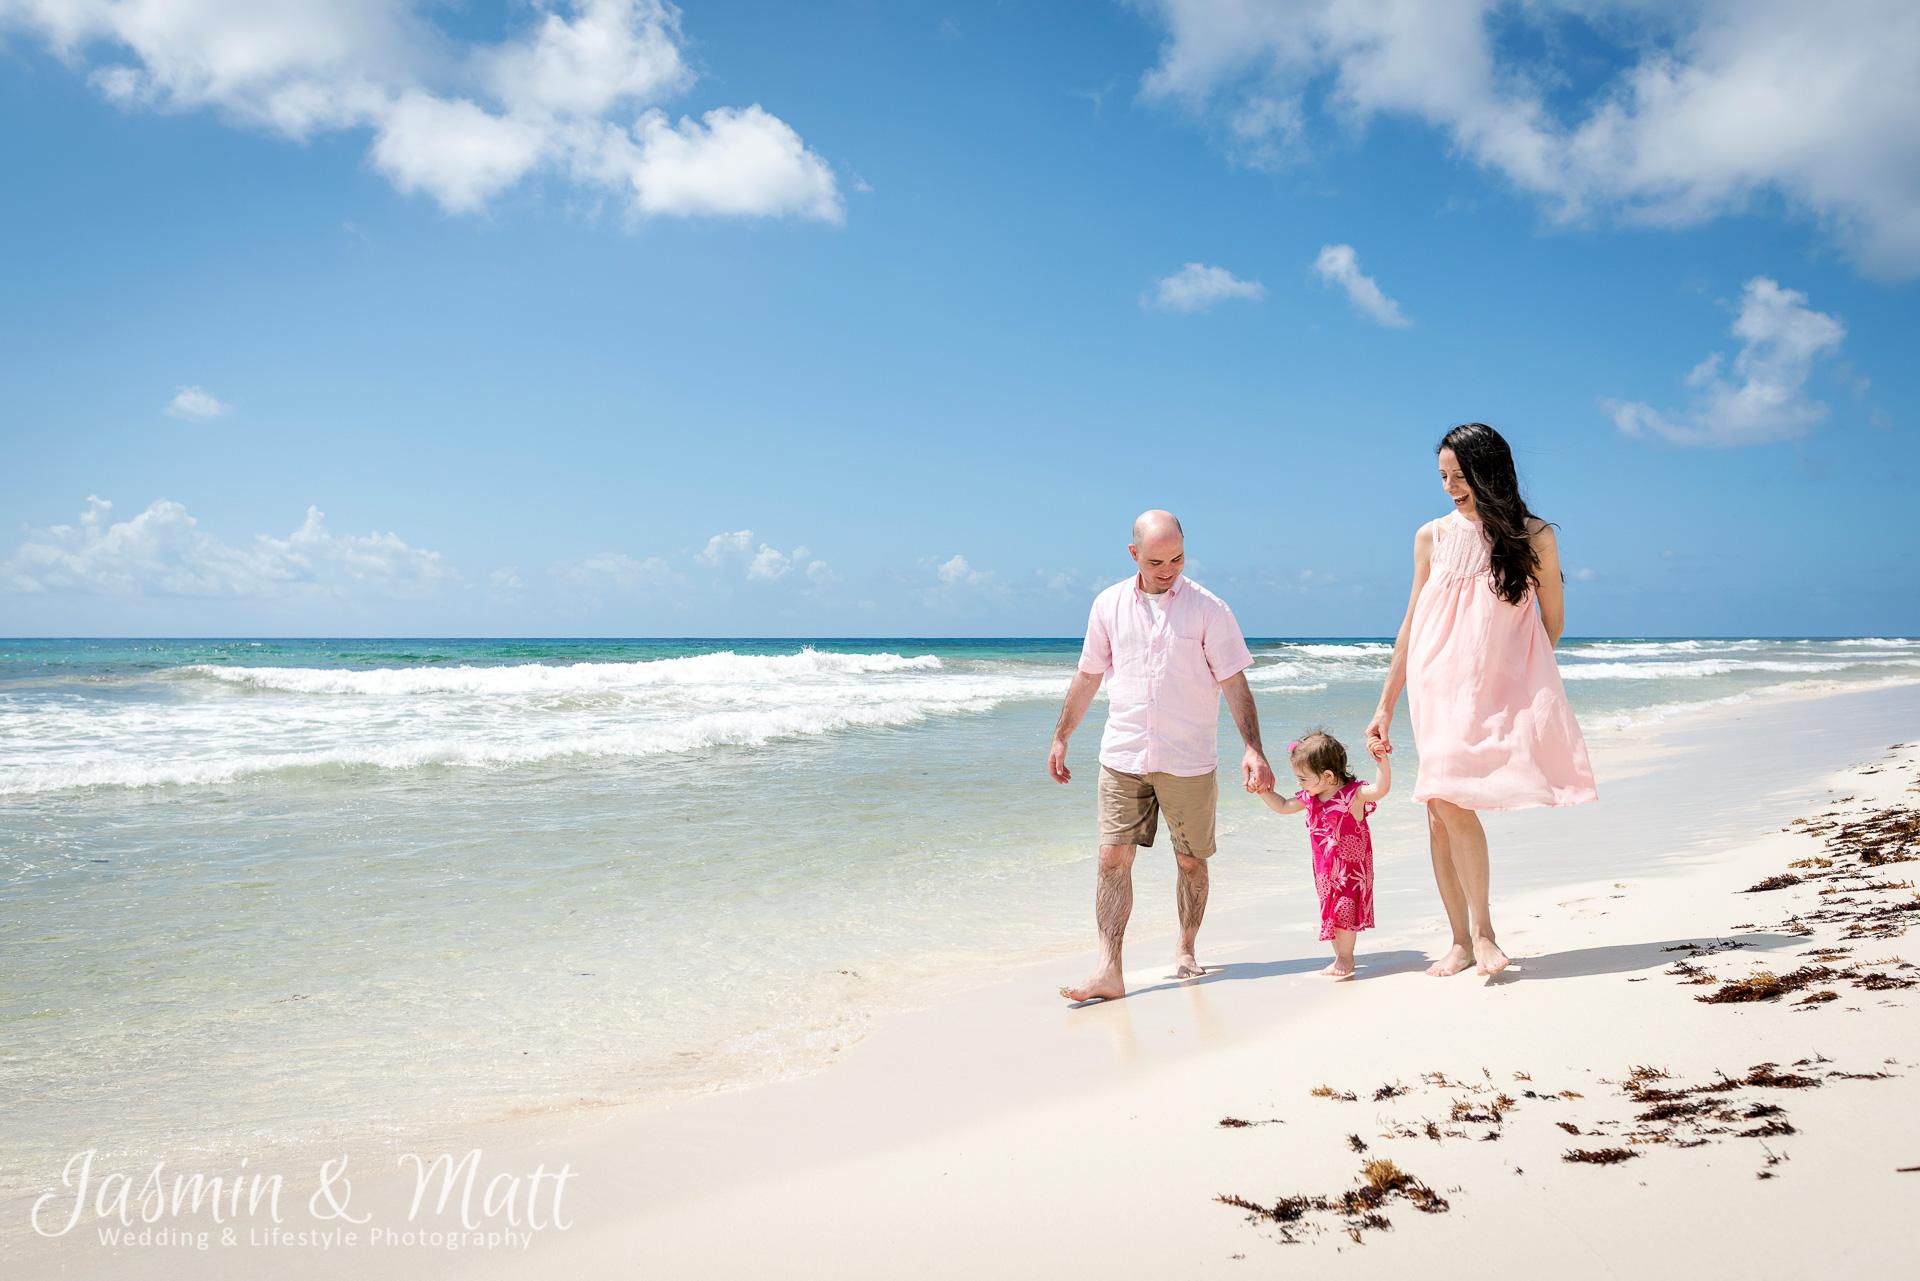 Jorgensen Family - Cozumel Family Photography